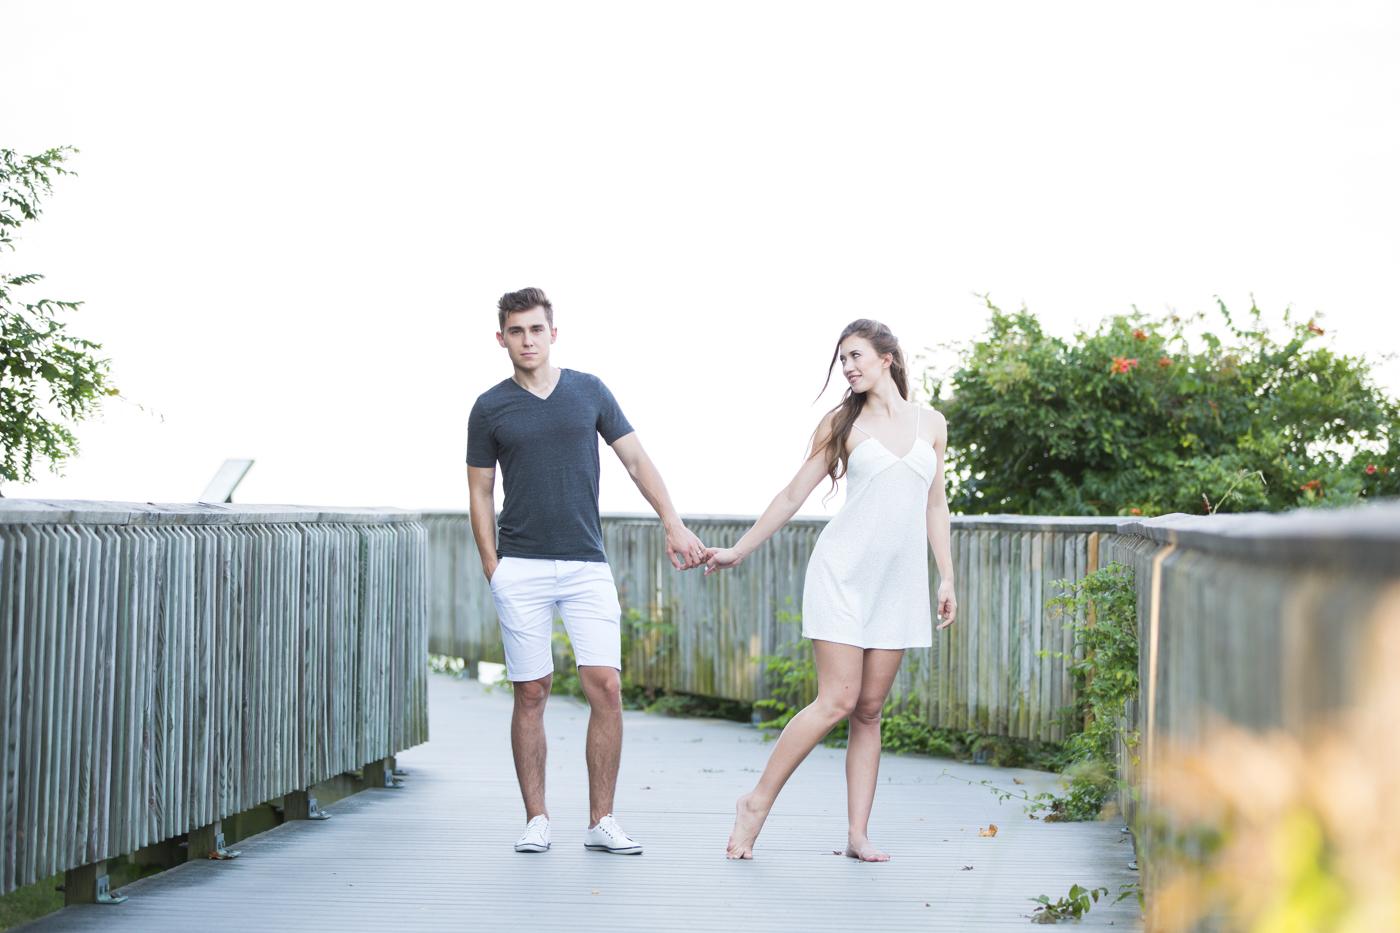 summer-beach-engagement-shoot-ksenia-pro-photography-16